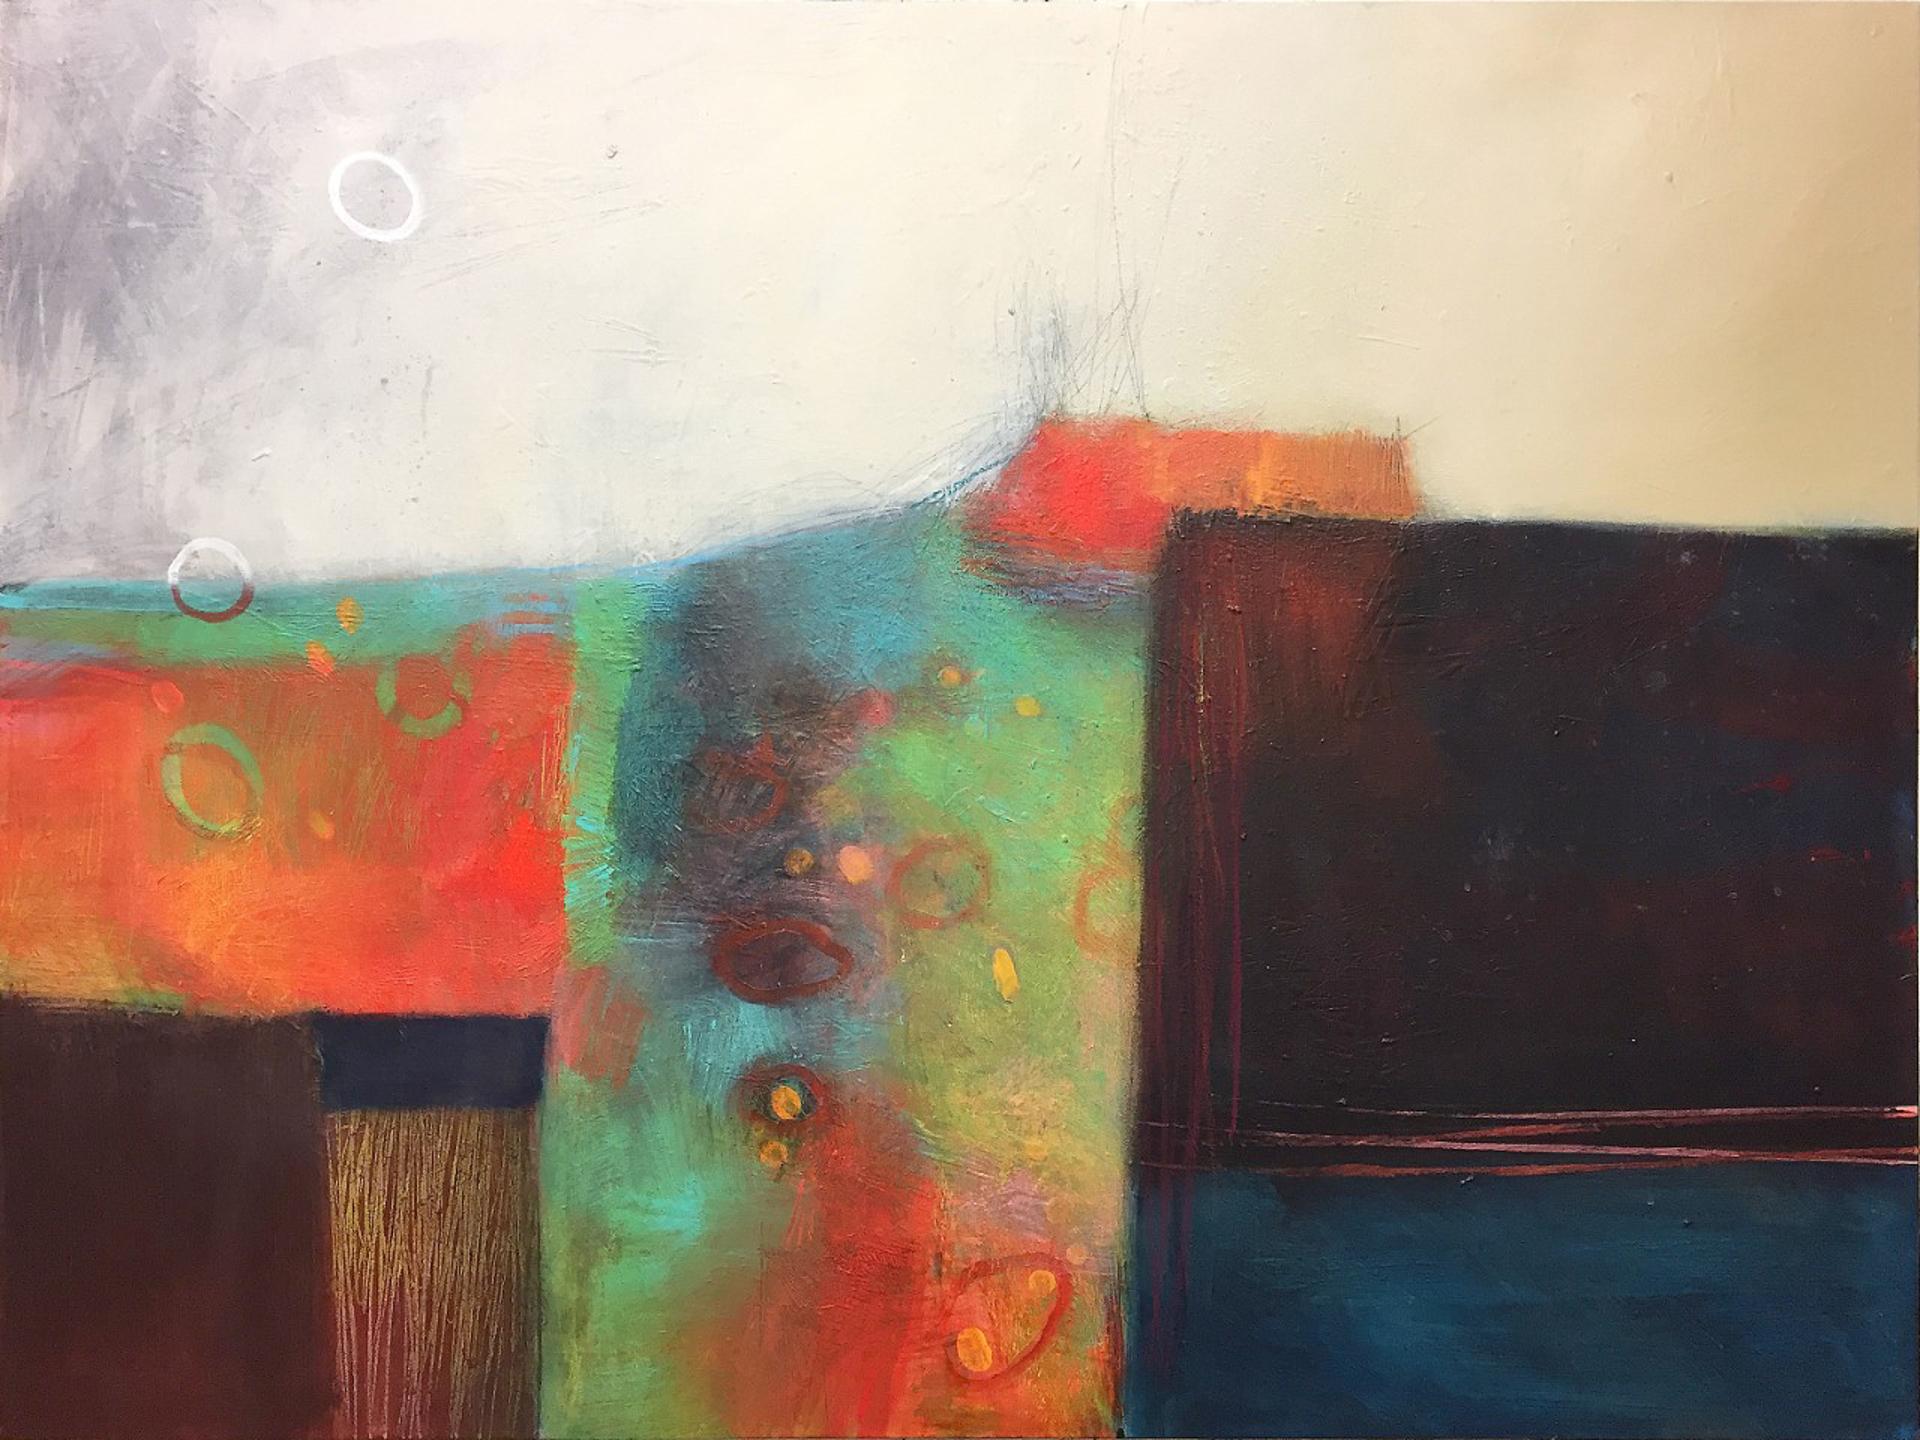 Untitled 199194 by Karen Roehl